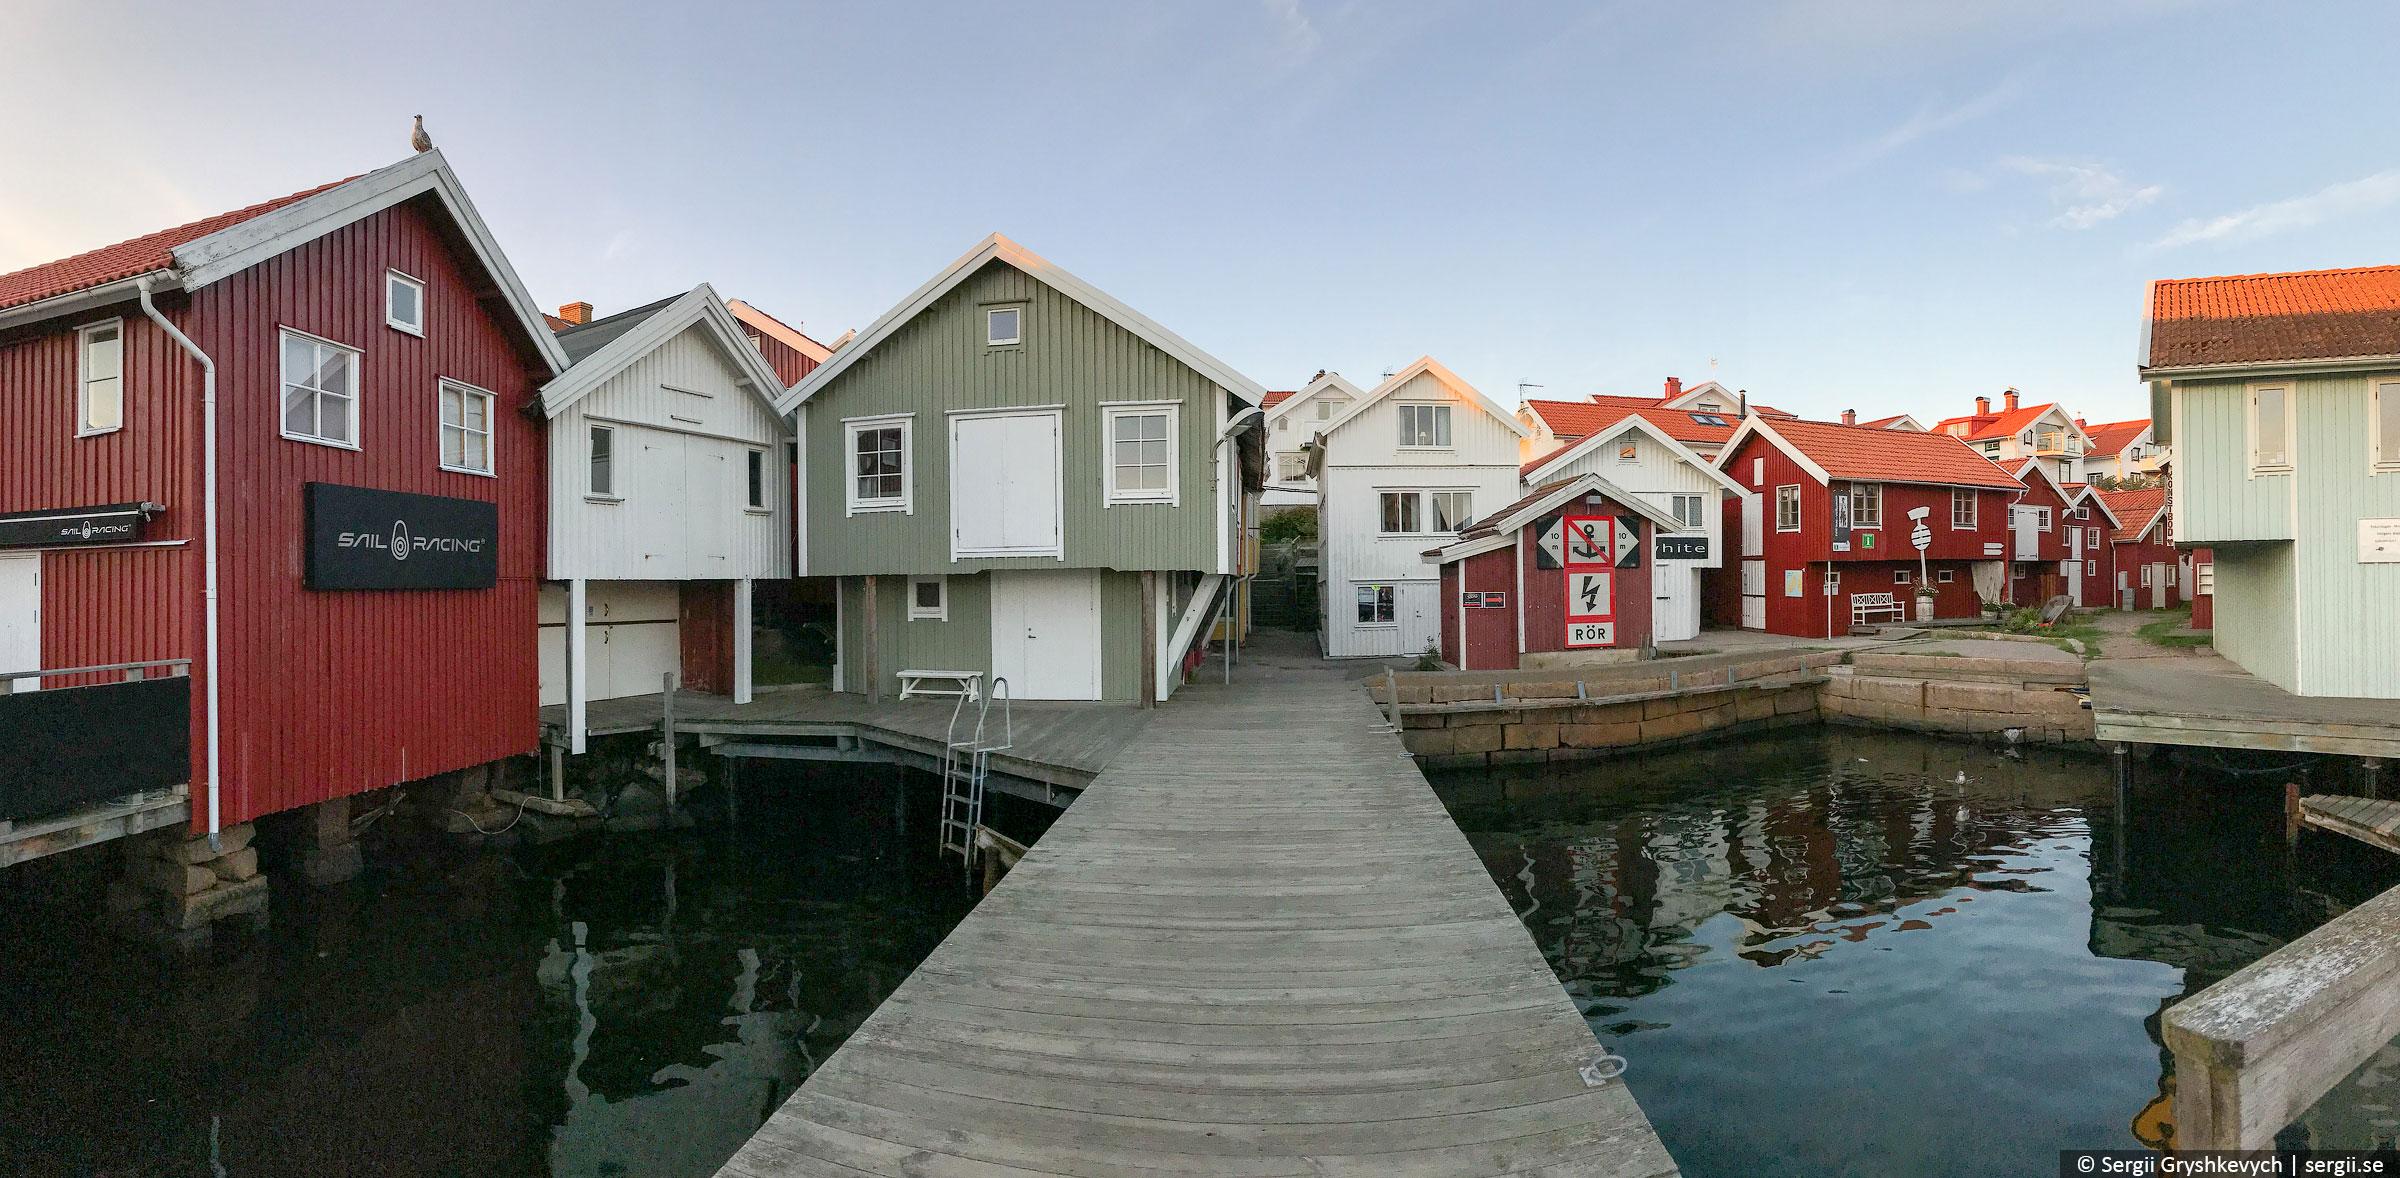 west-coast-sweden-2018-36